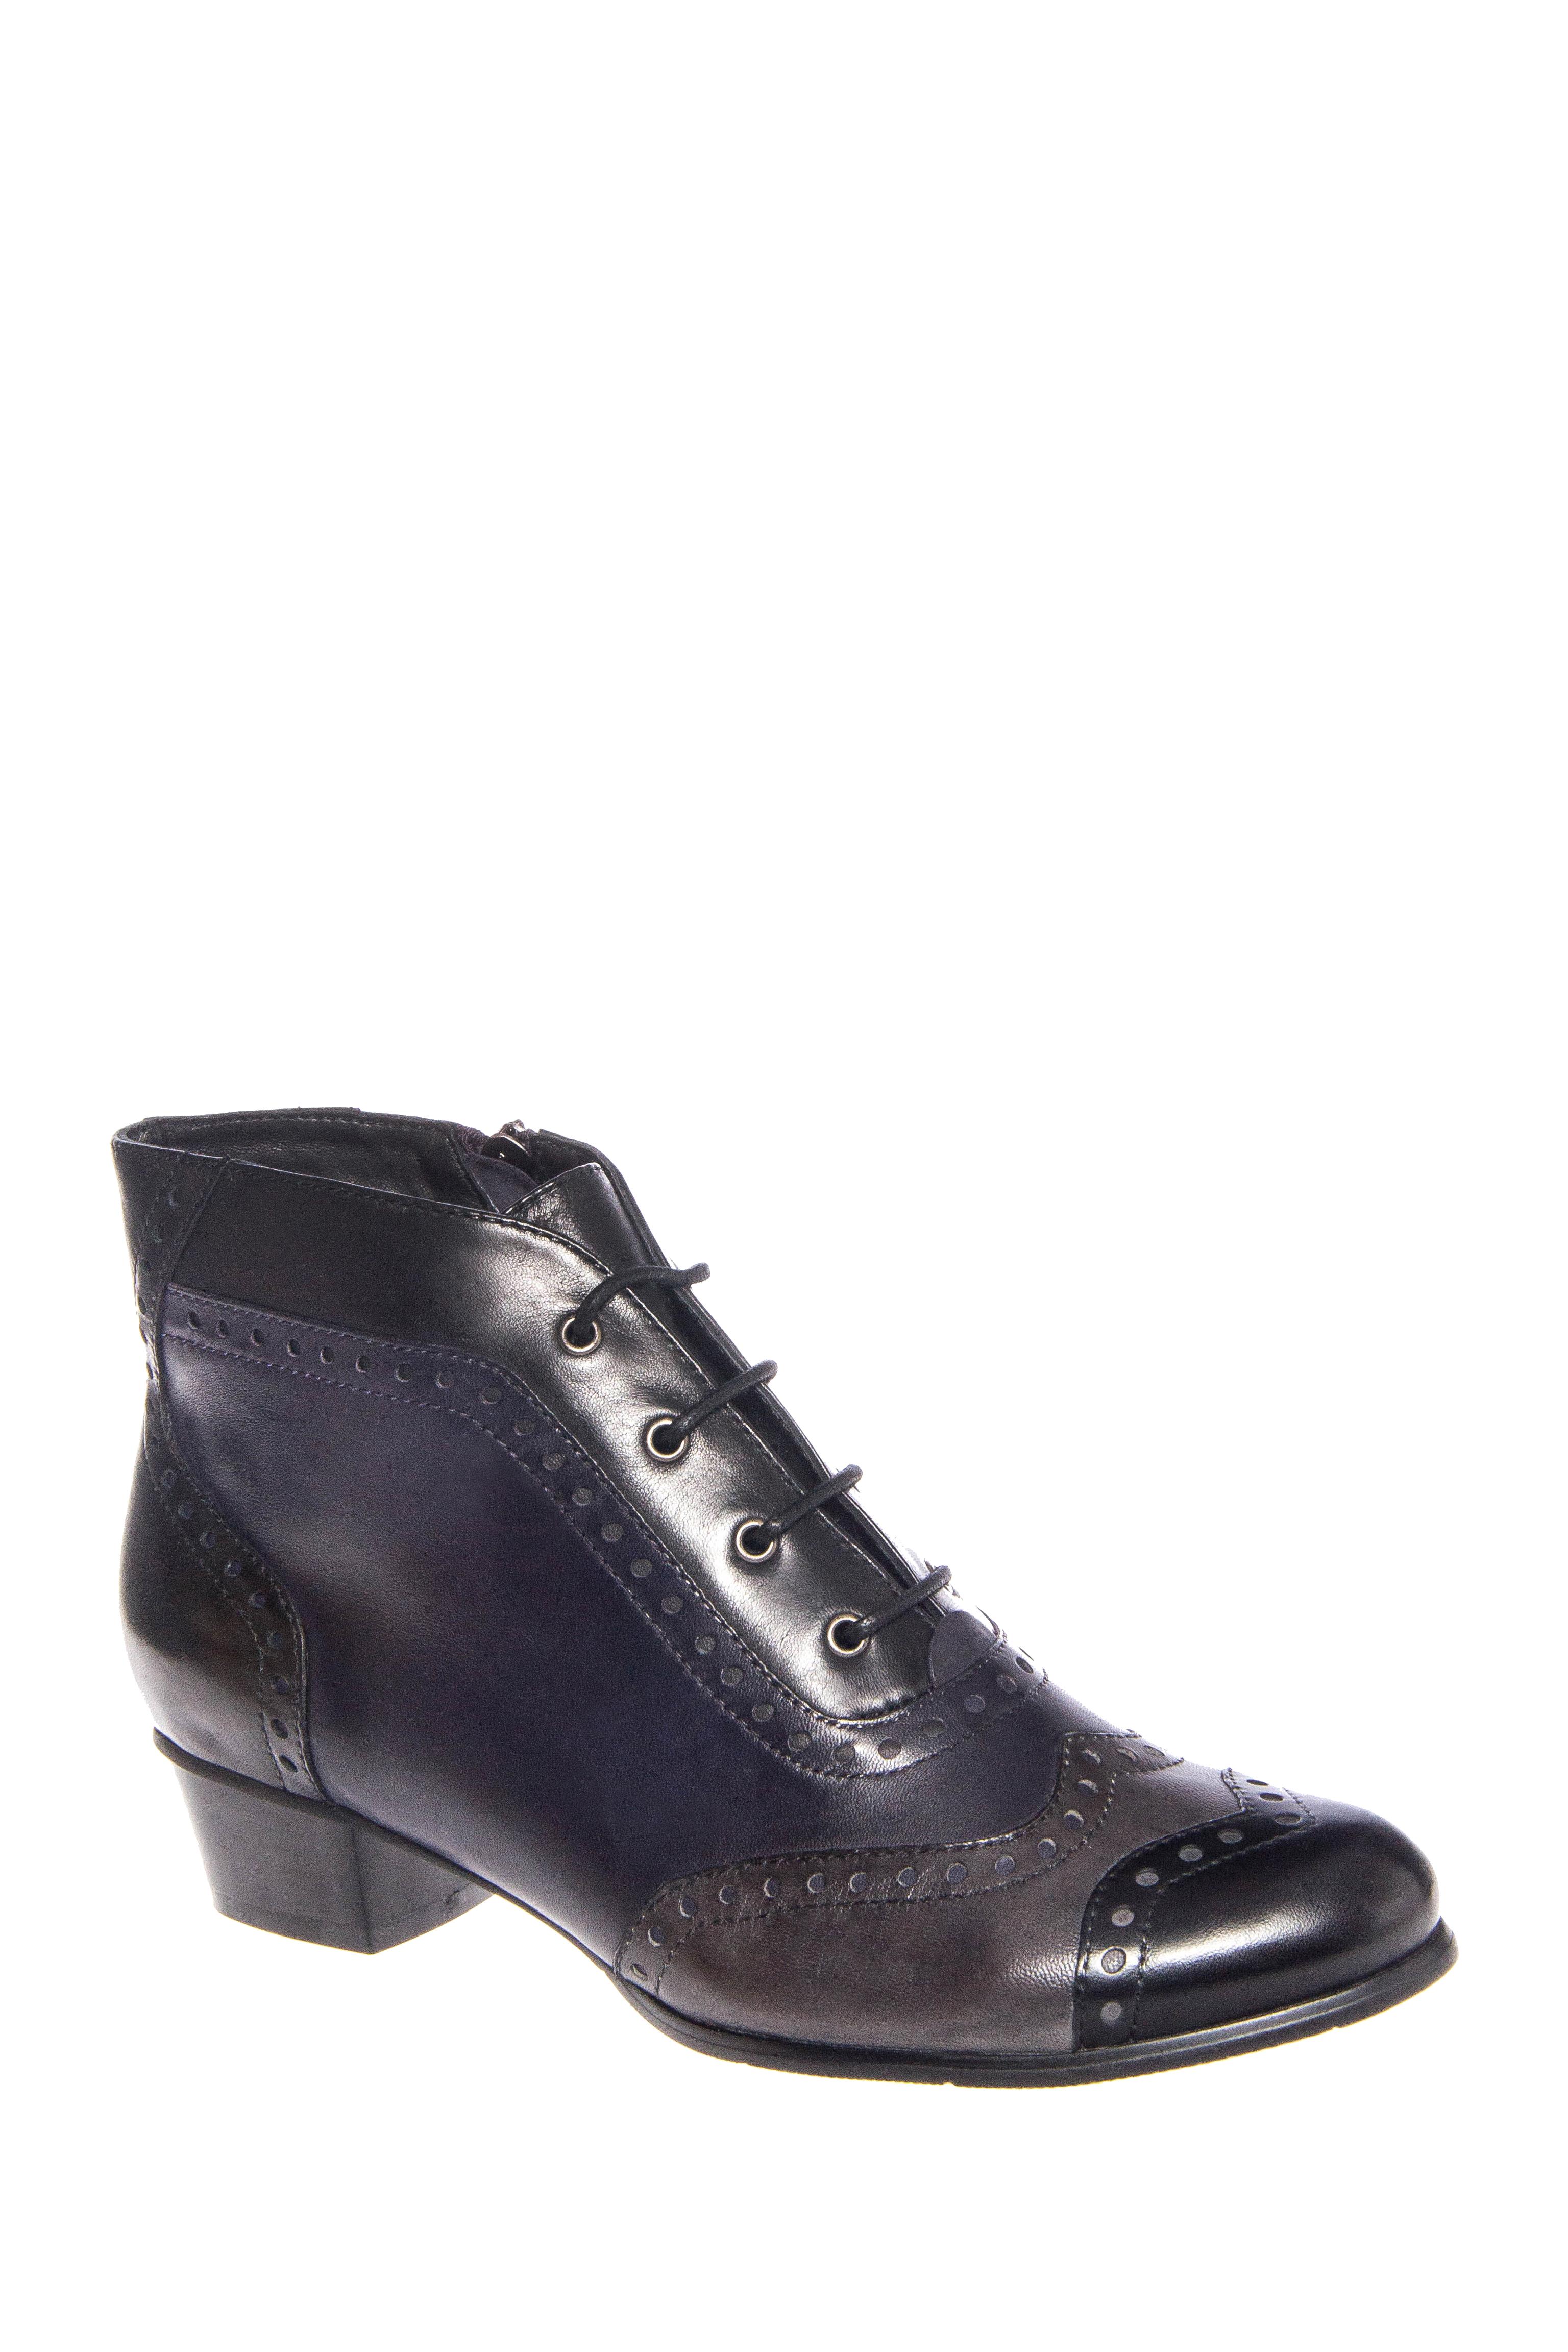 Heroic Low Heel Oxford $150.00 AT vintagedancer.com